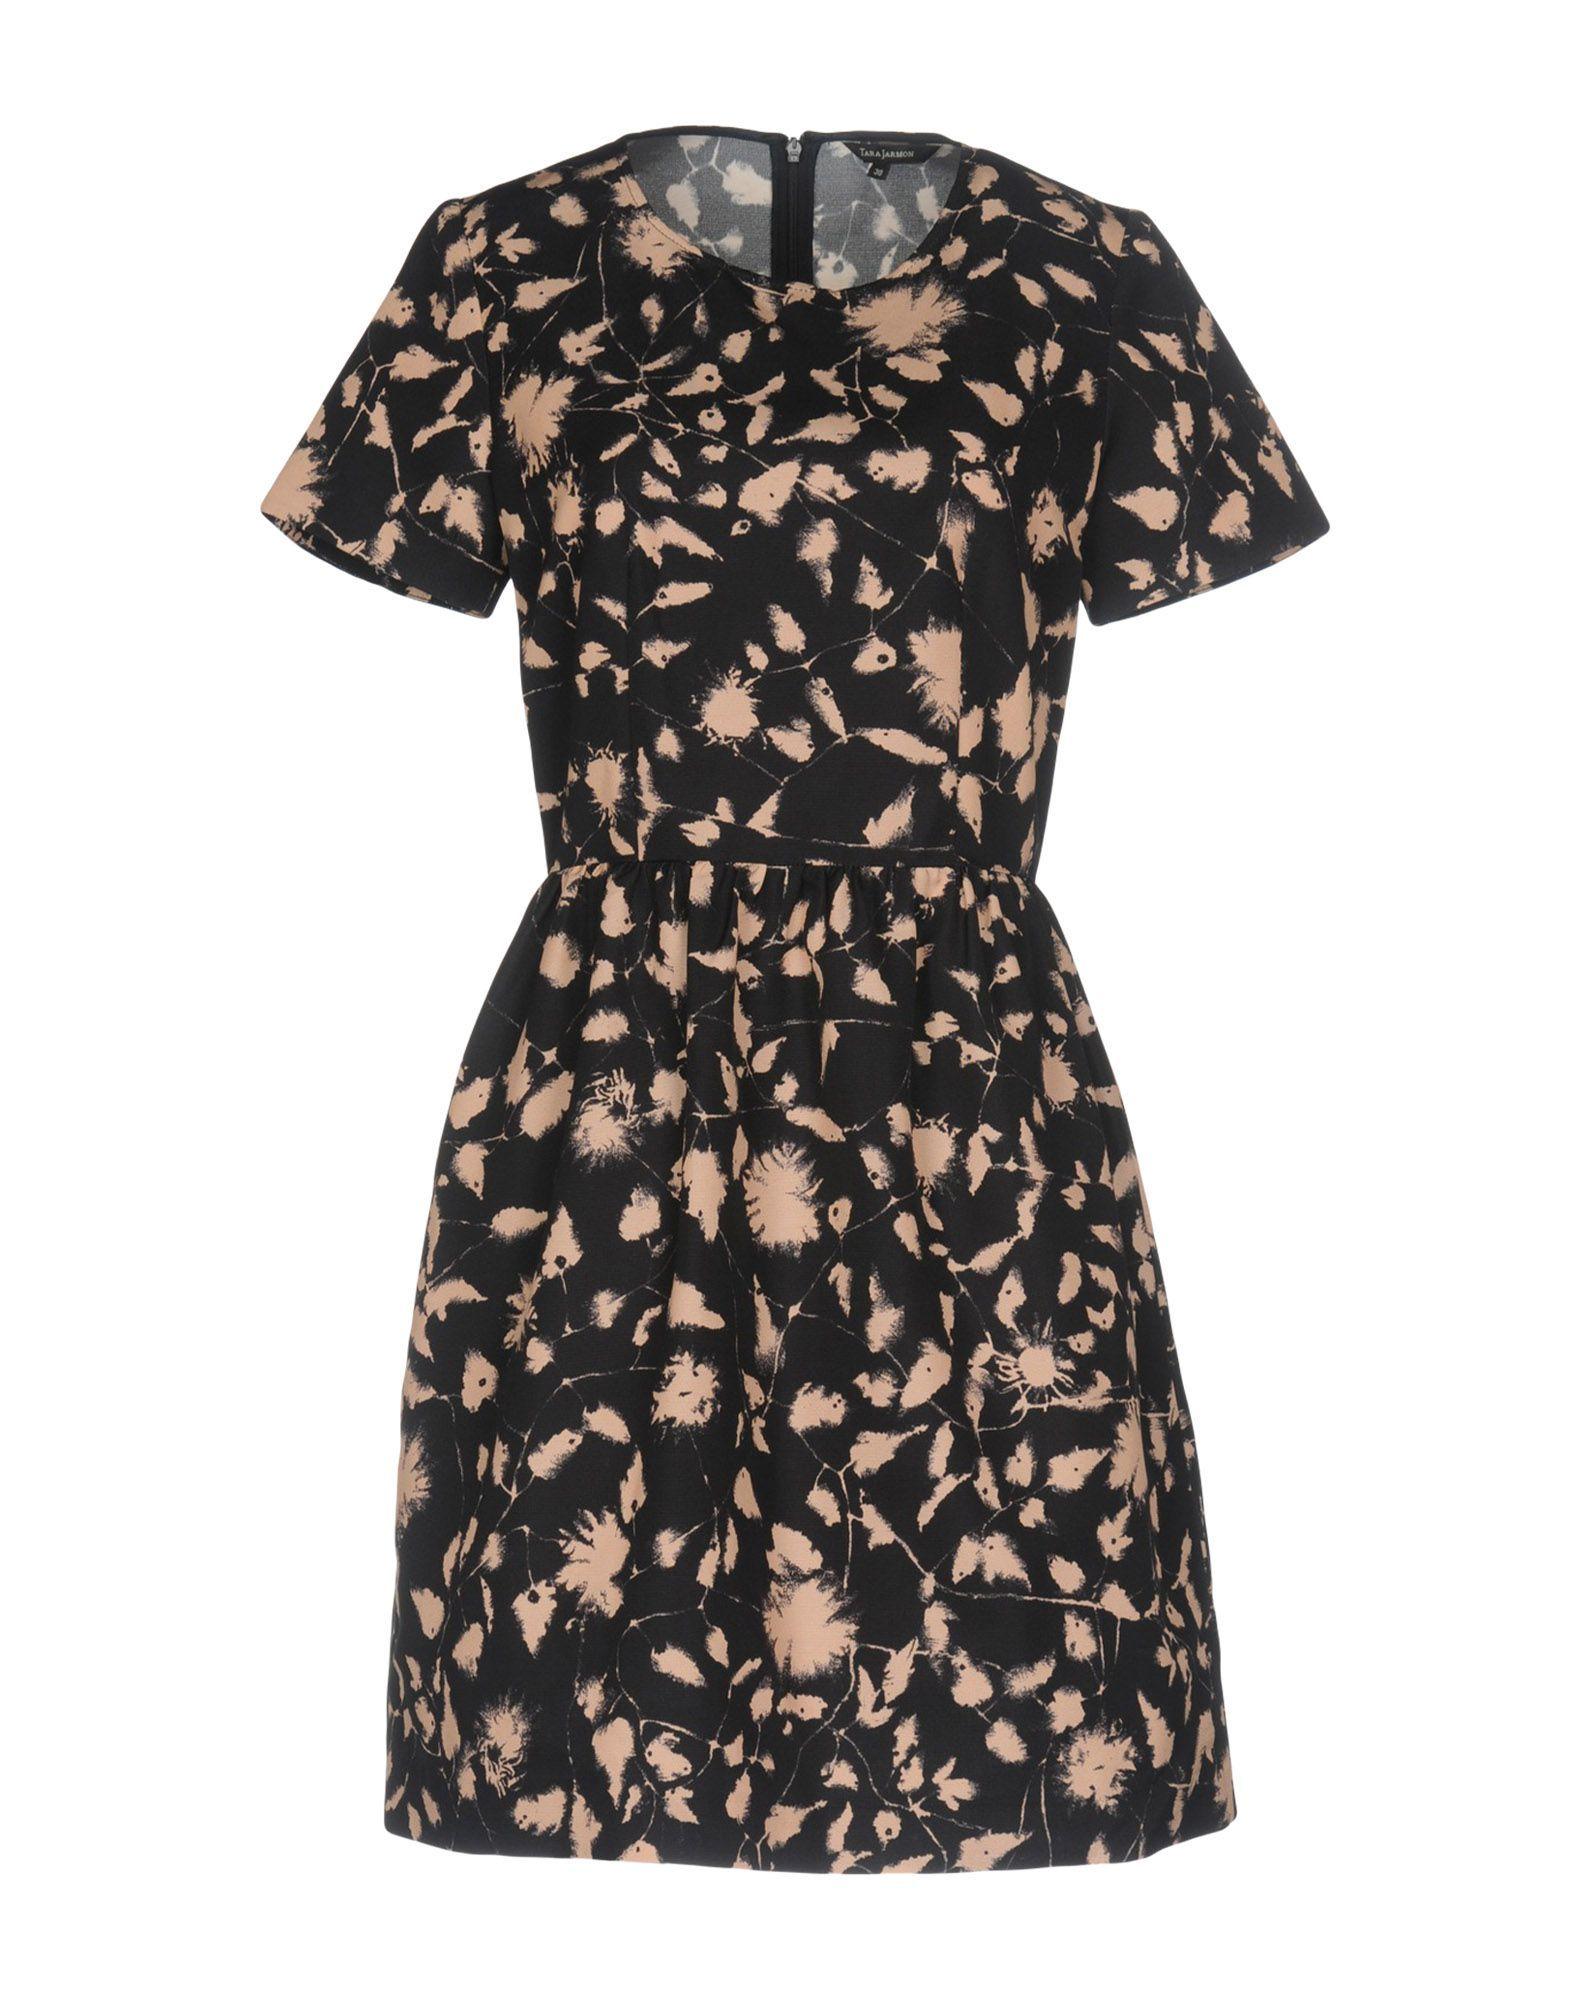 Tara Jarmon Dark Blue Cotton Jacquard Short Sleeve Dress